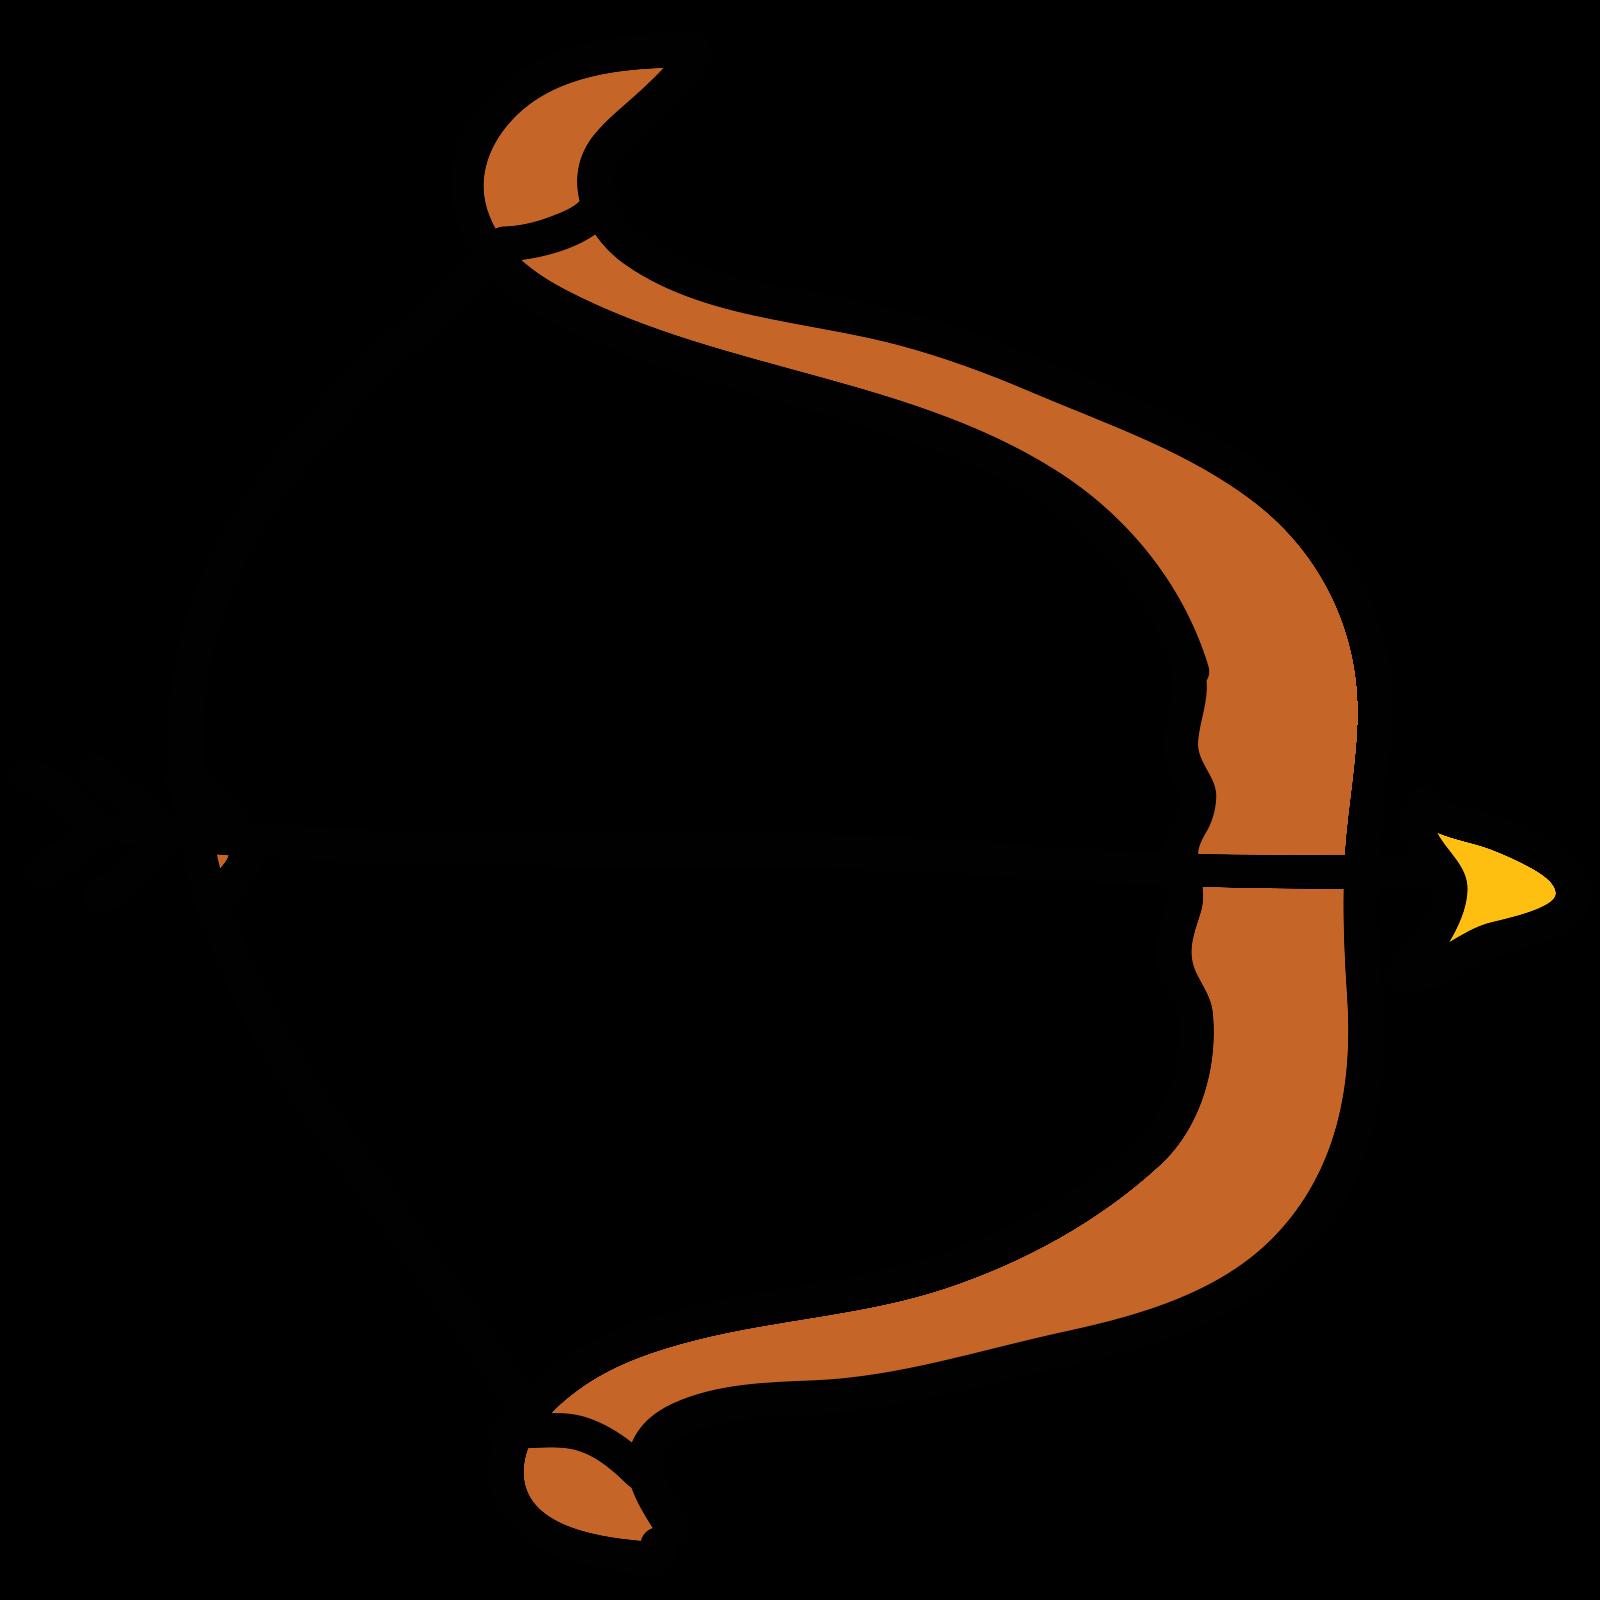 Łucznik icon